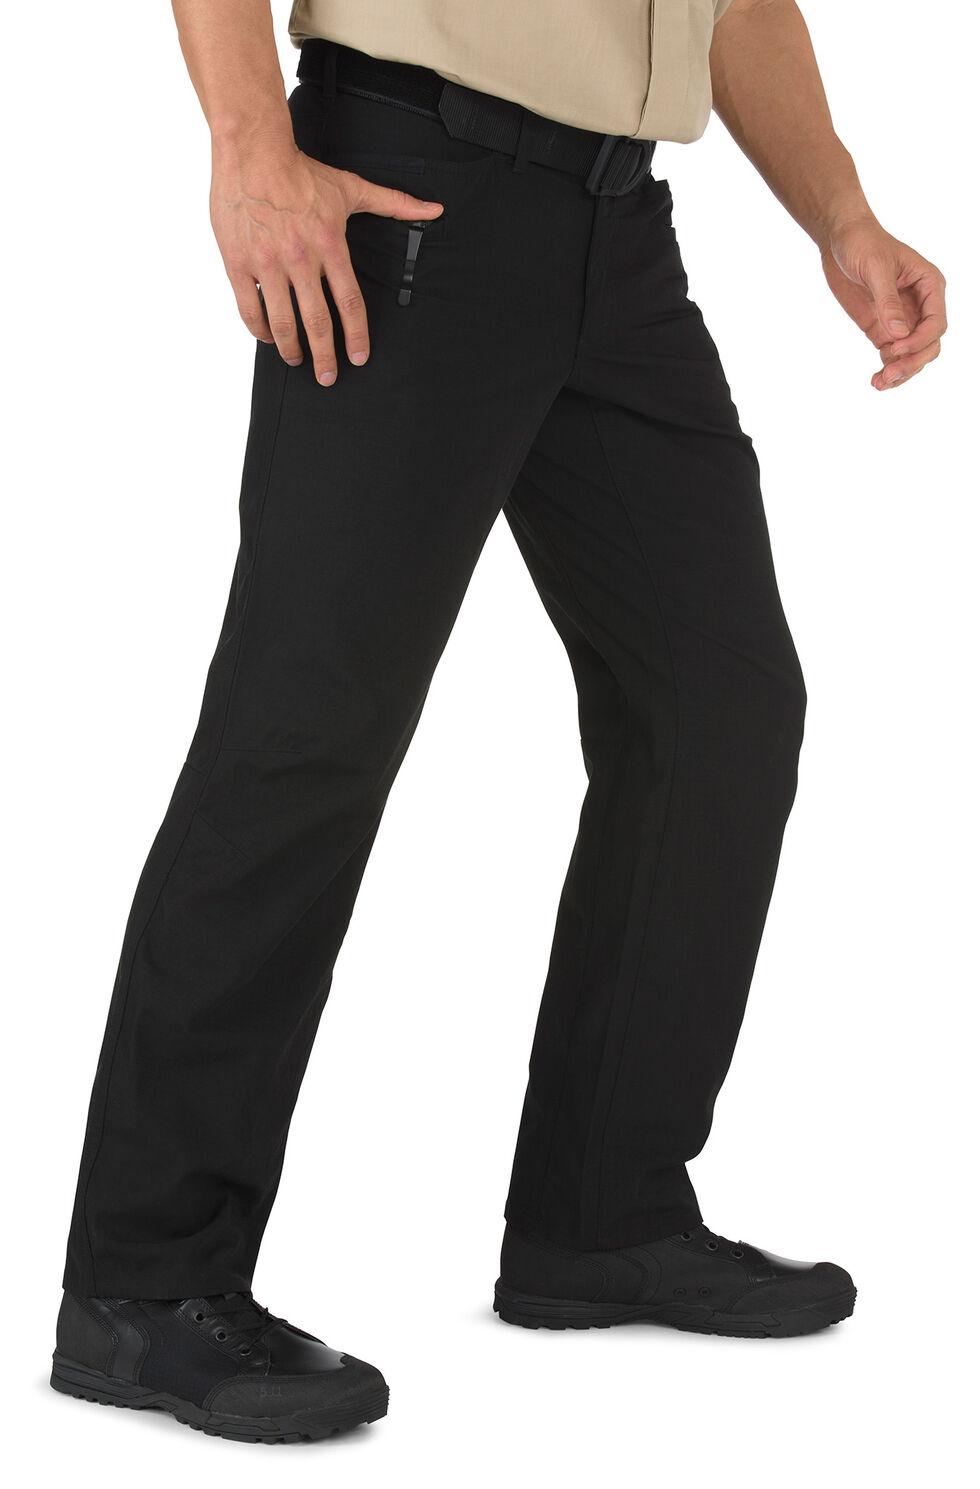 5.11 Tactical Ridgeline Pants, Black, hi-res